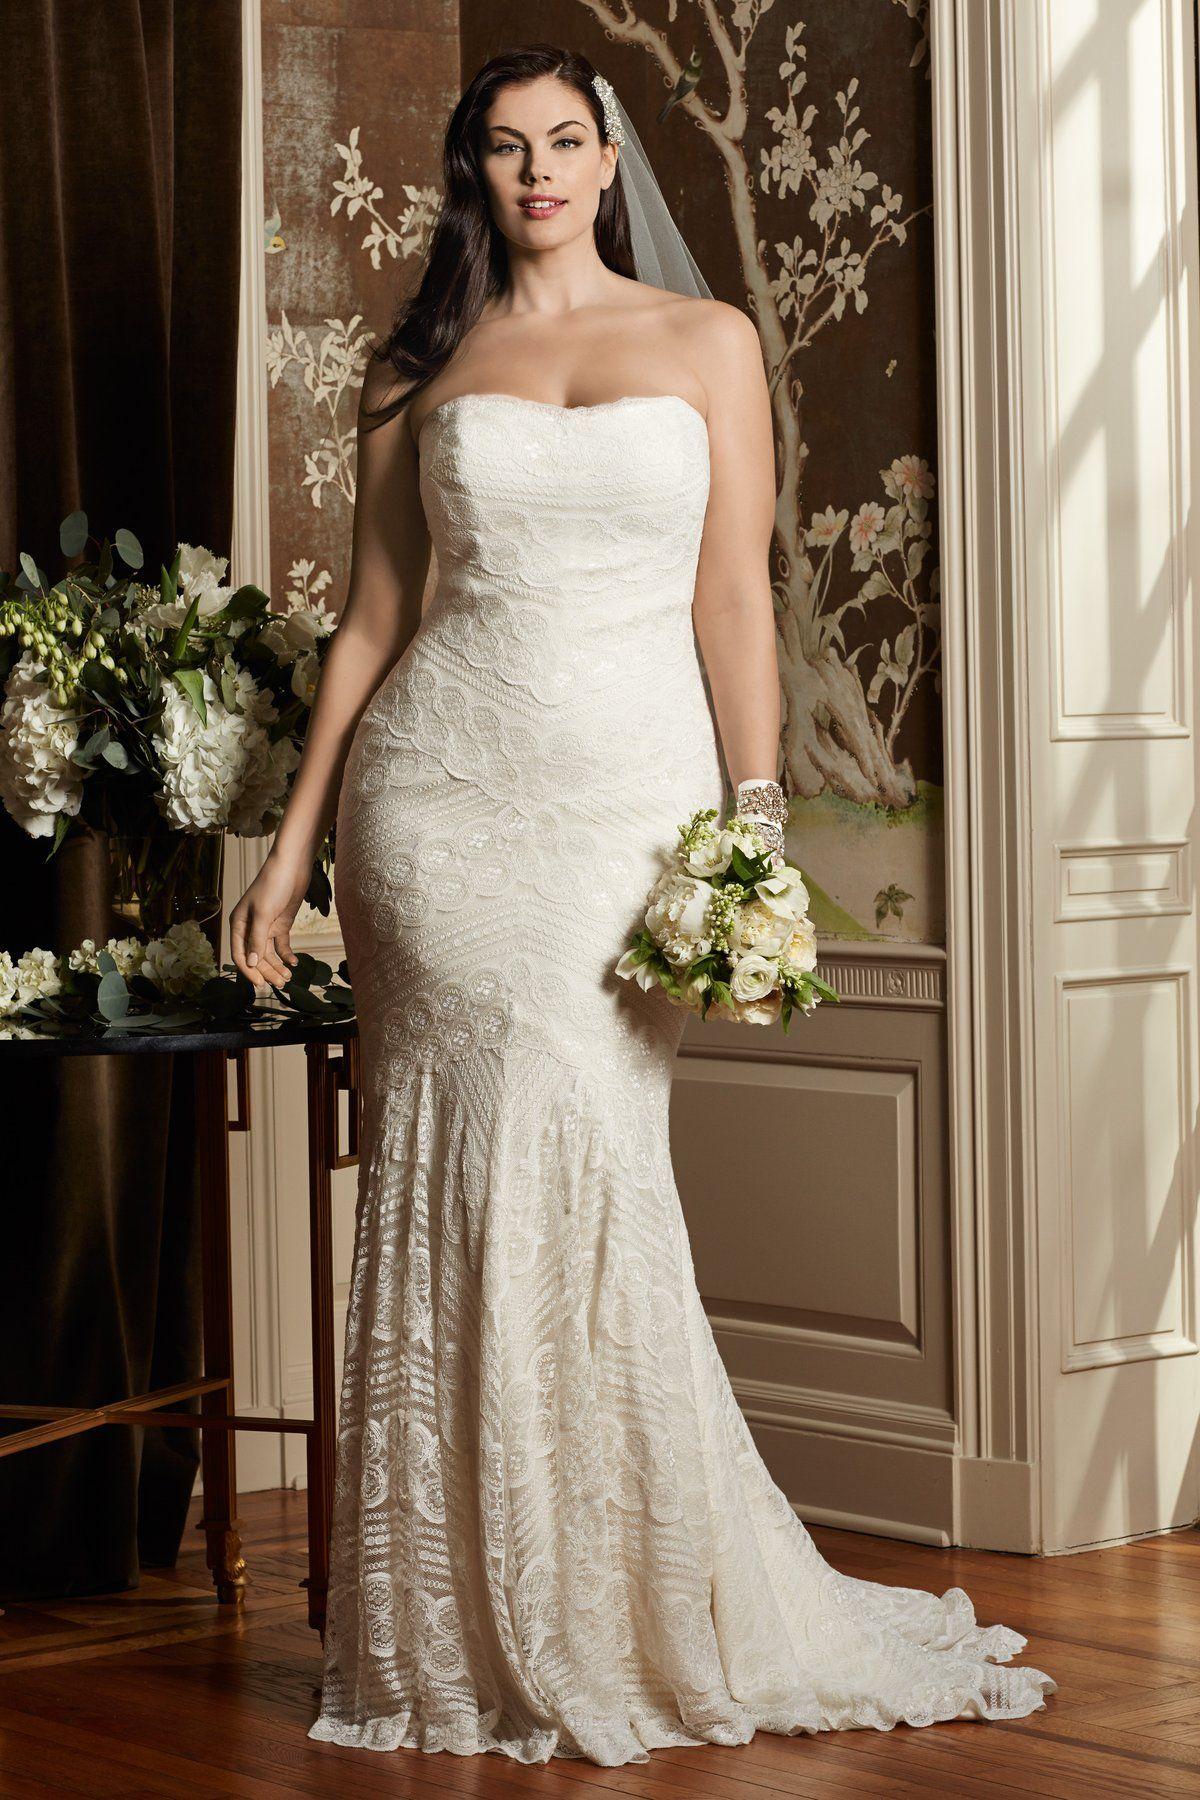 Plus size wedding dresses with red accents  Vestidos de novia